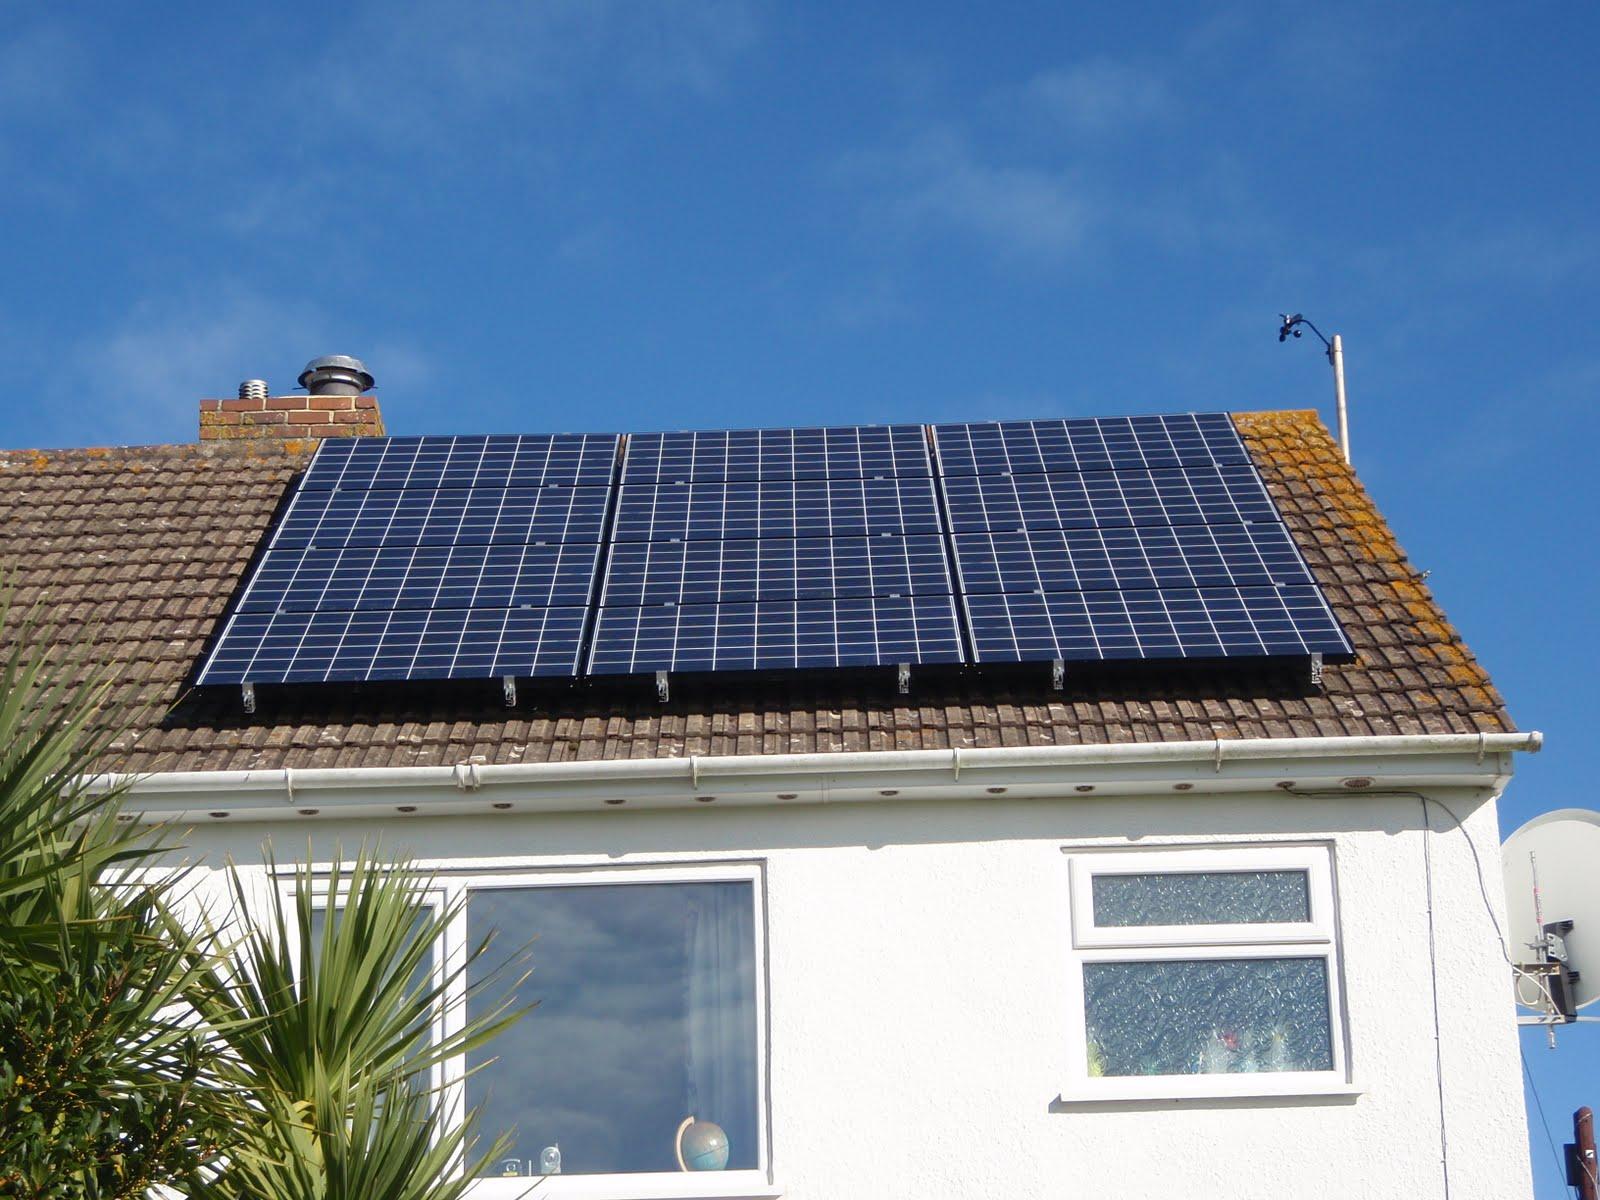 Zippy S Solar Blog Scaffolding Down Today